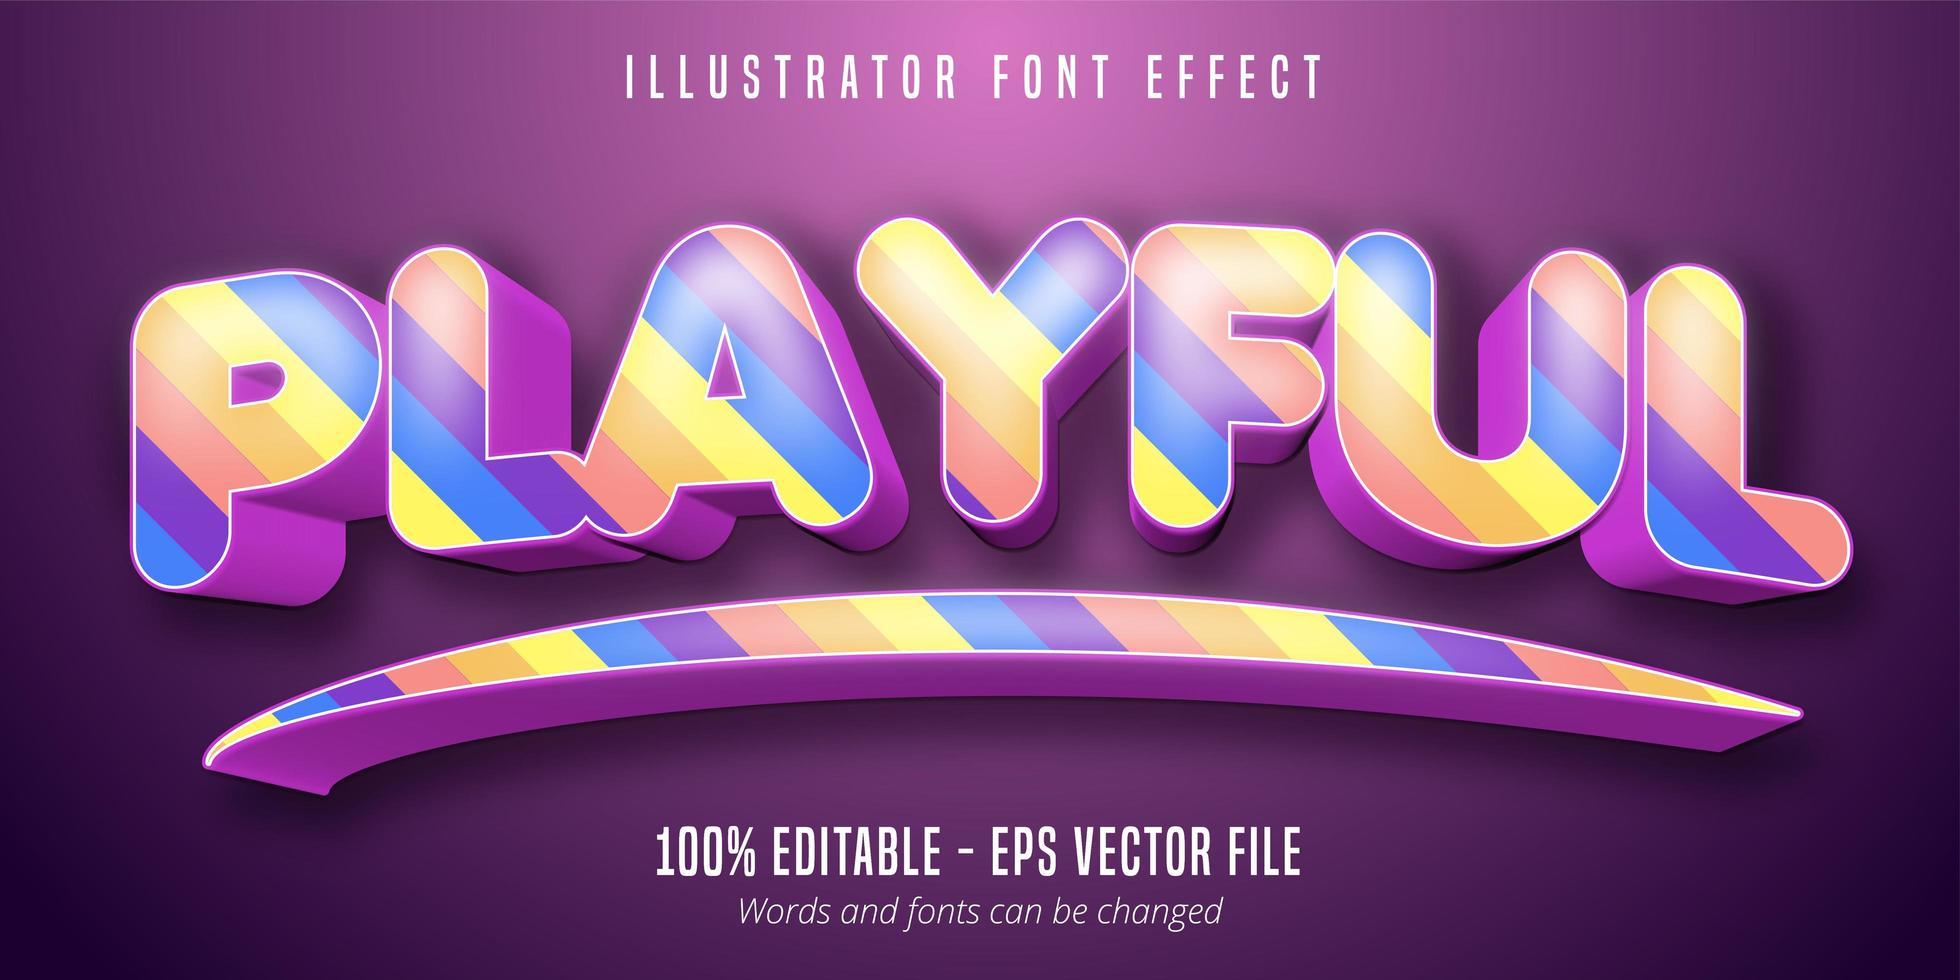 Playful text, 3d colorful editable font effect vector